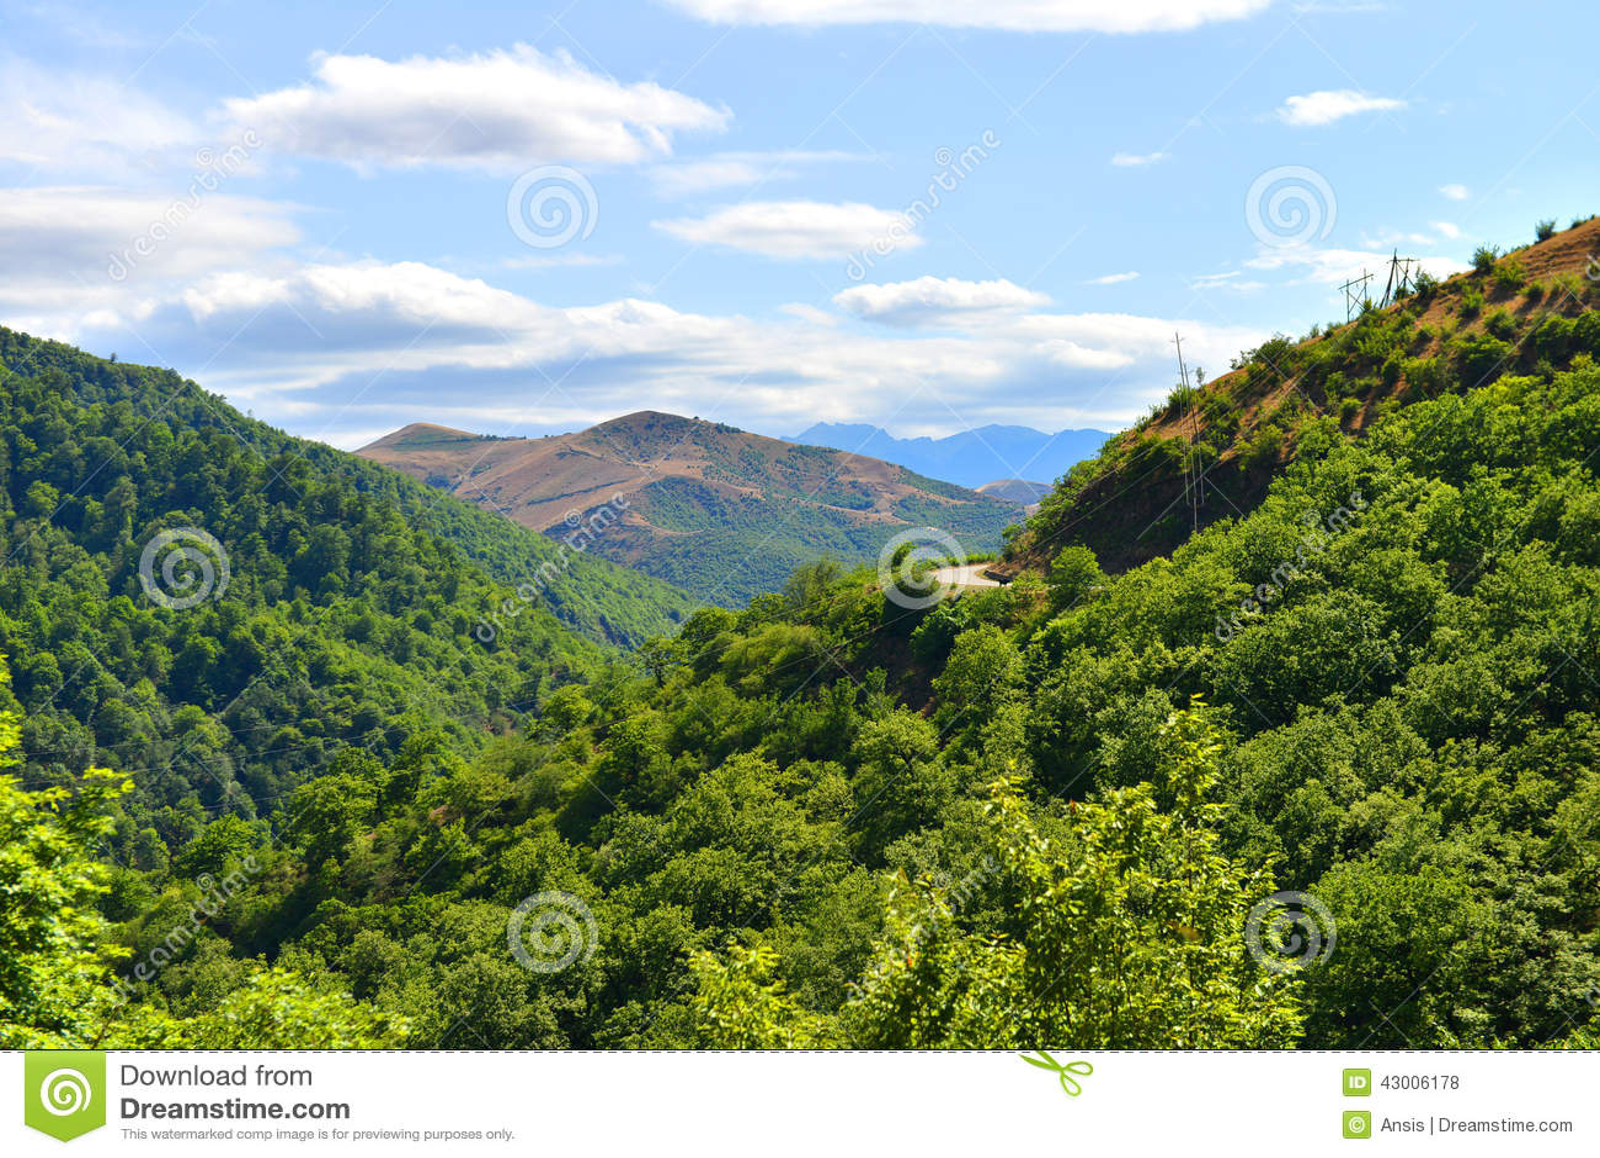 Азербайджан природа фотографии 7